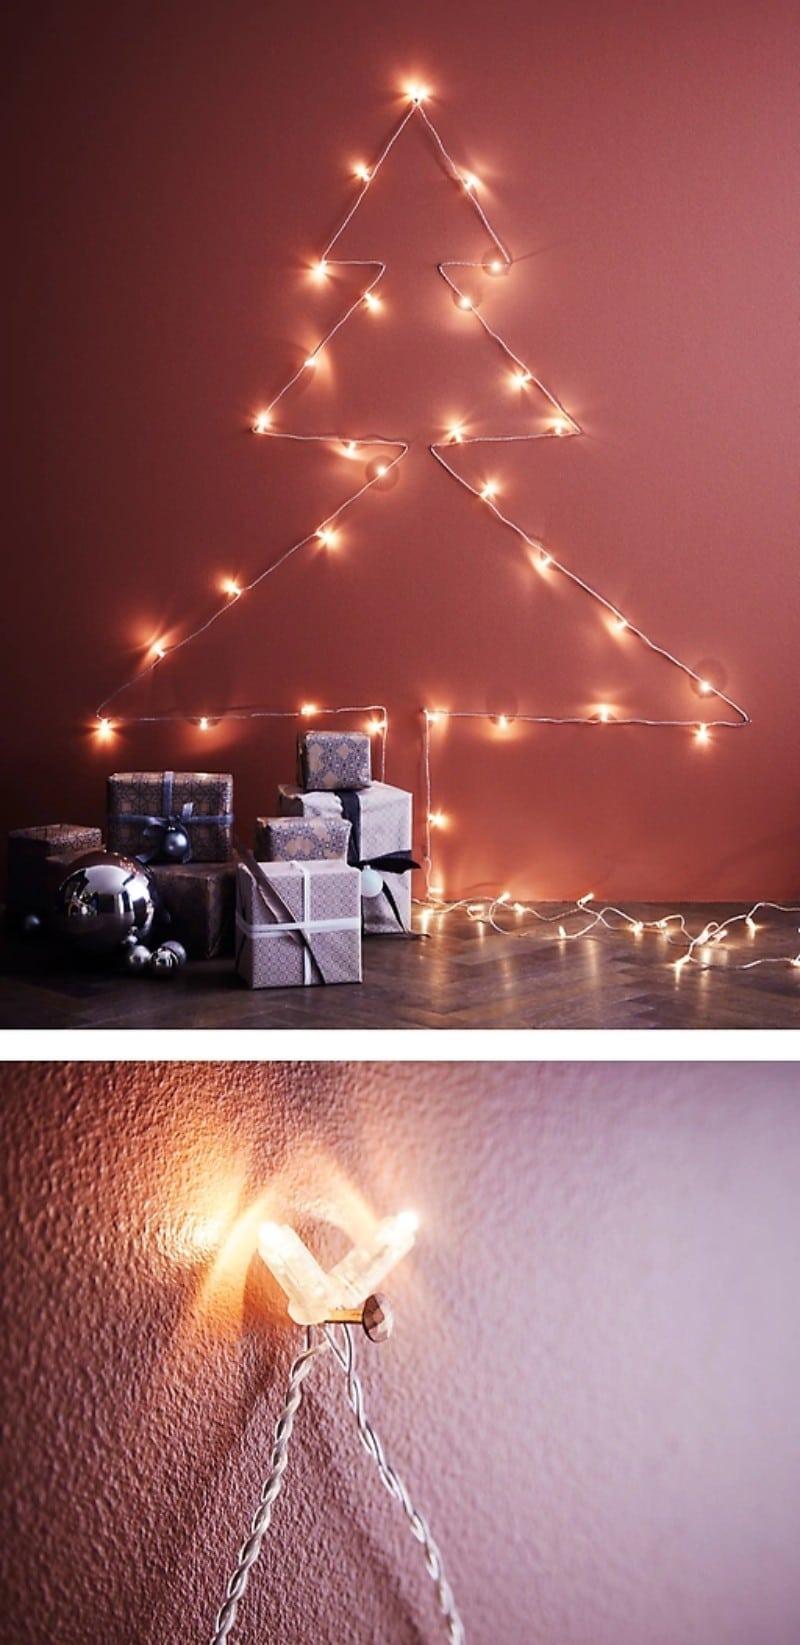 ikea-ikea-holiday-decoration__1364463987252-s3 (1)